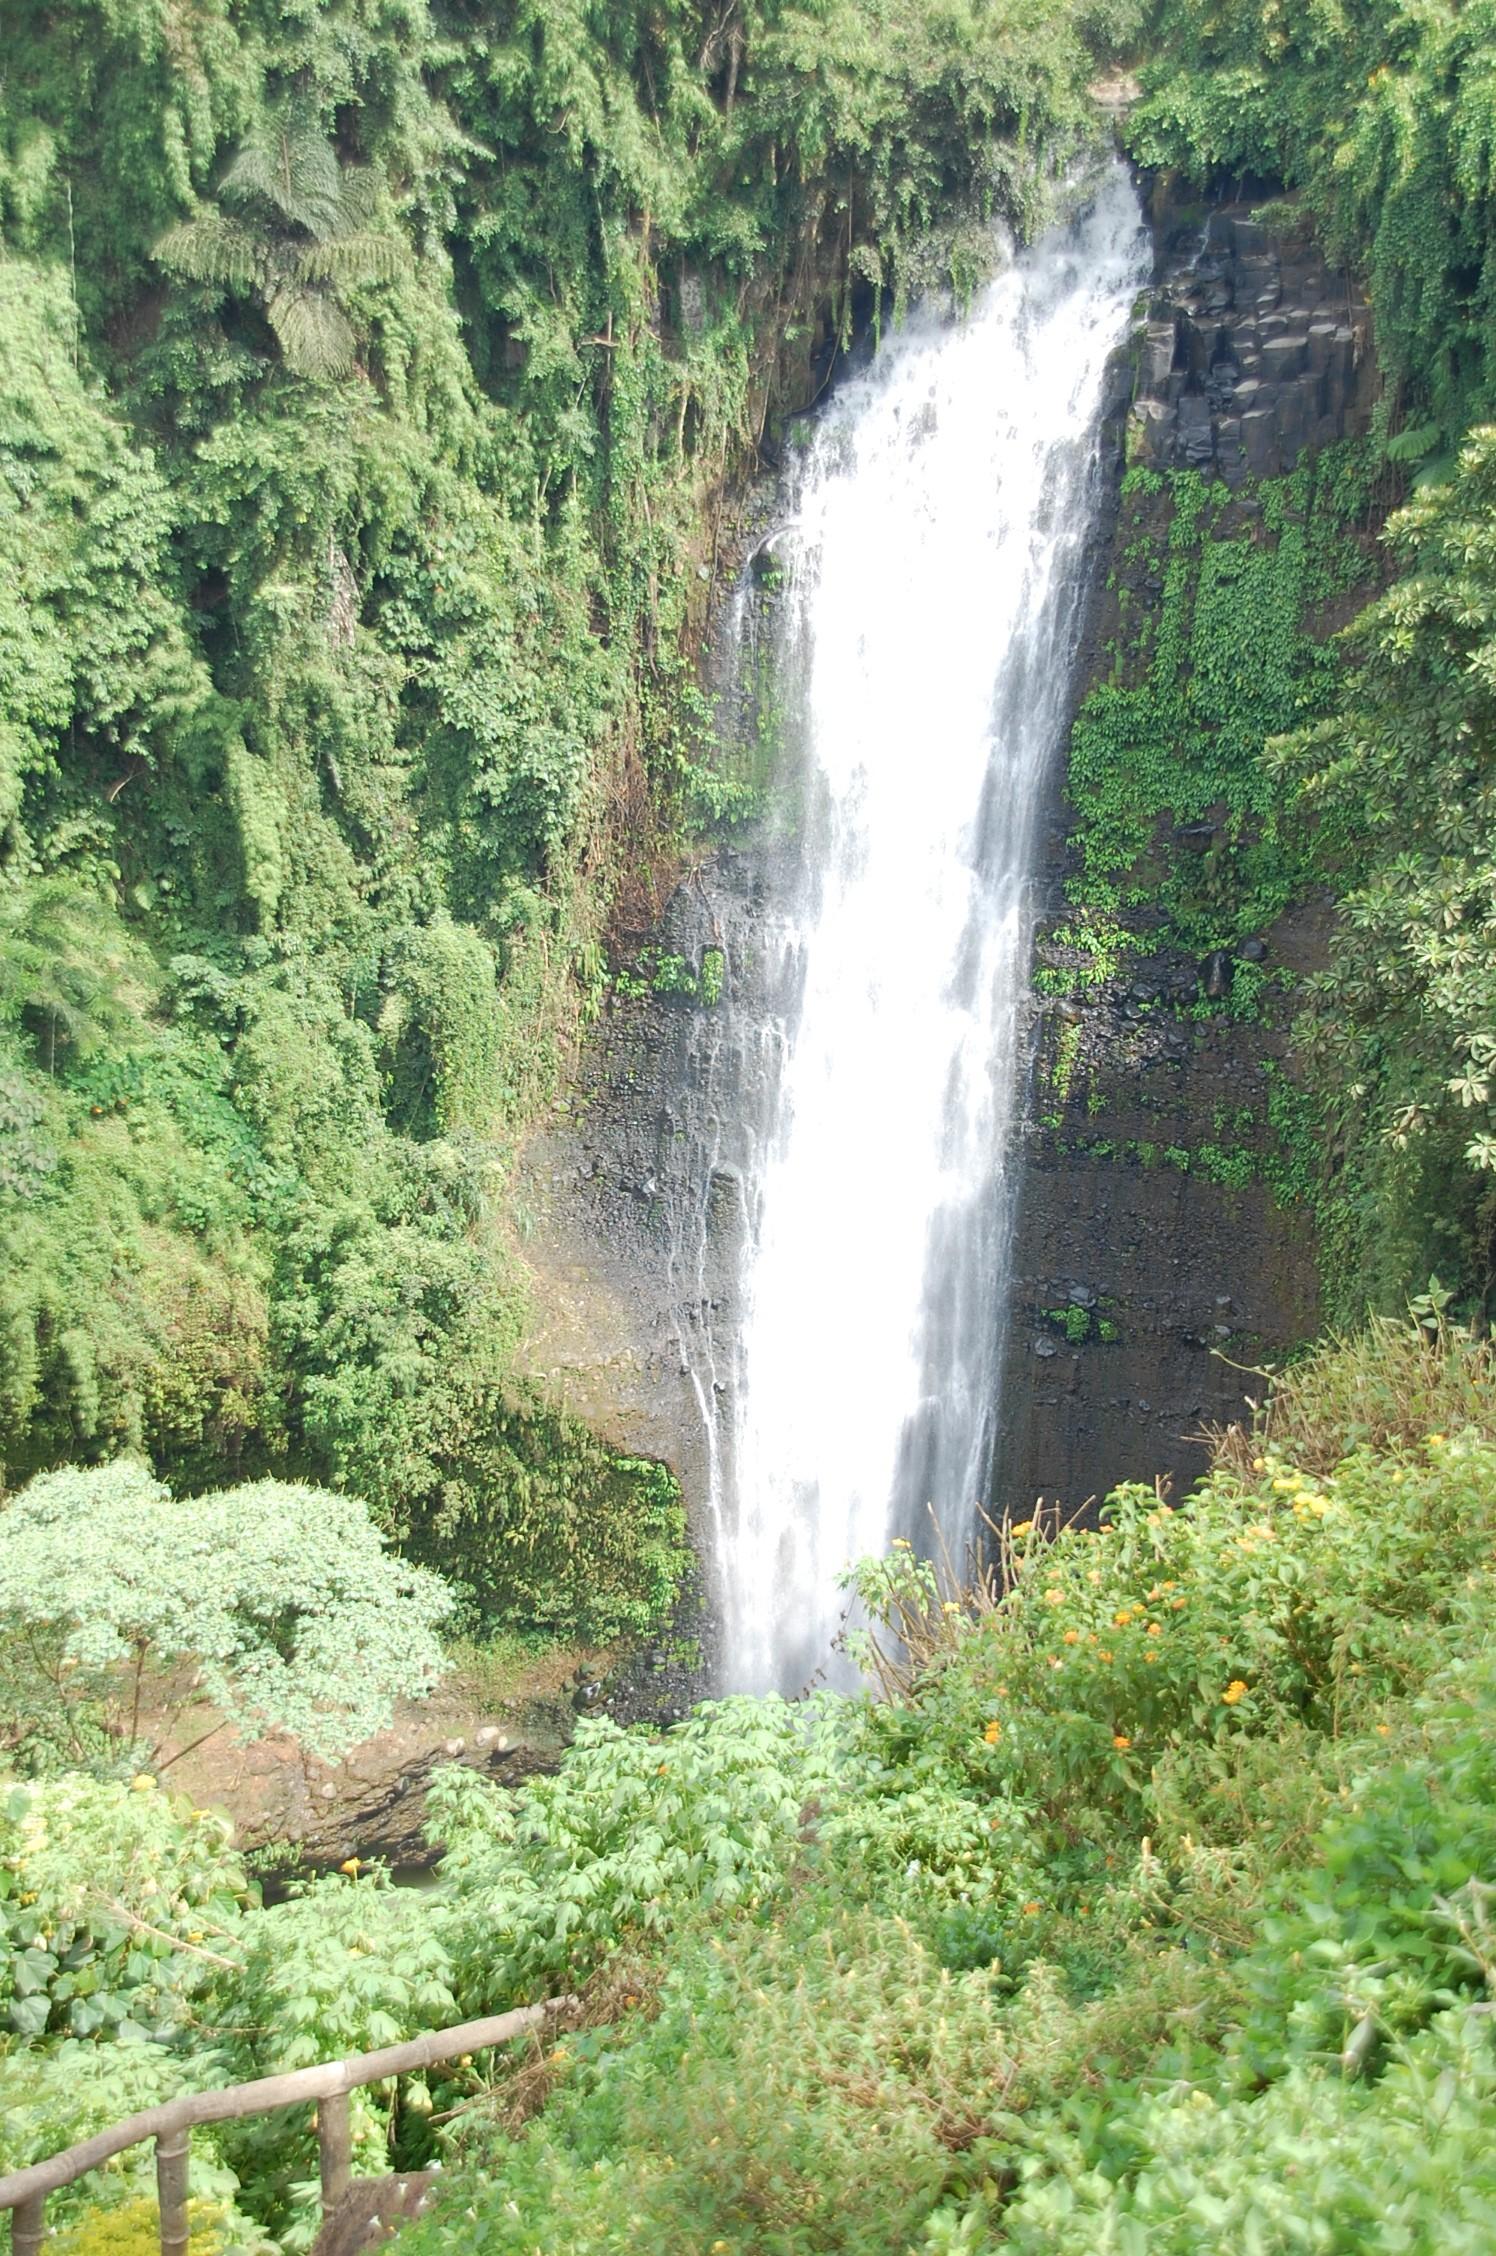 bukidnon tourist spot - alalum waterfalls